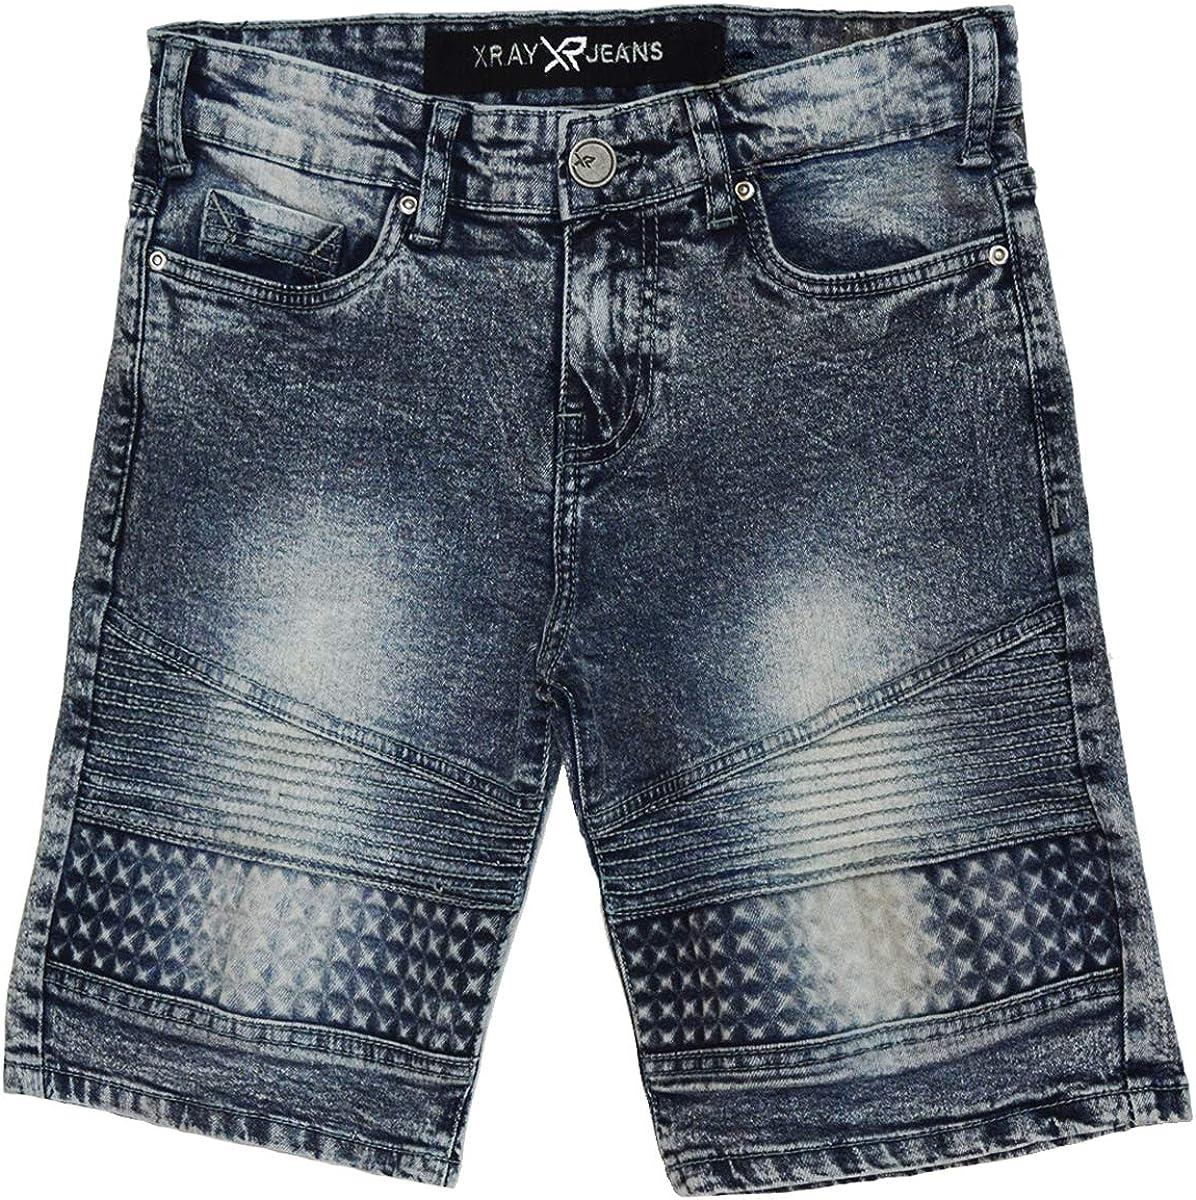 X RAY Kids Moto Biker Jean Shorts Slim Fit Boys Denim Shorts Stretch Washed Distressed